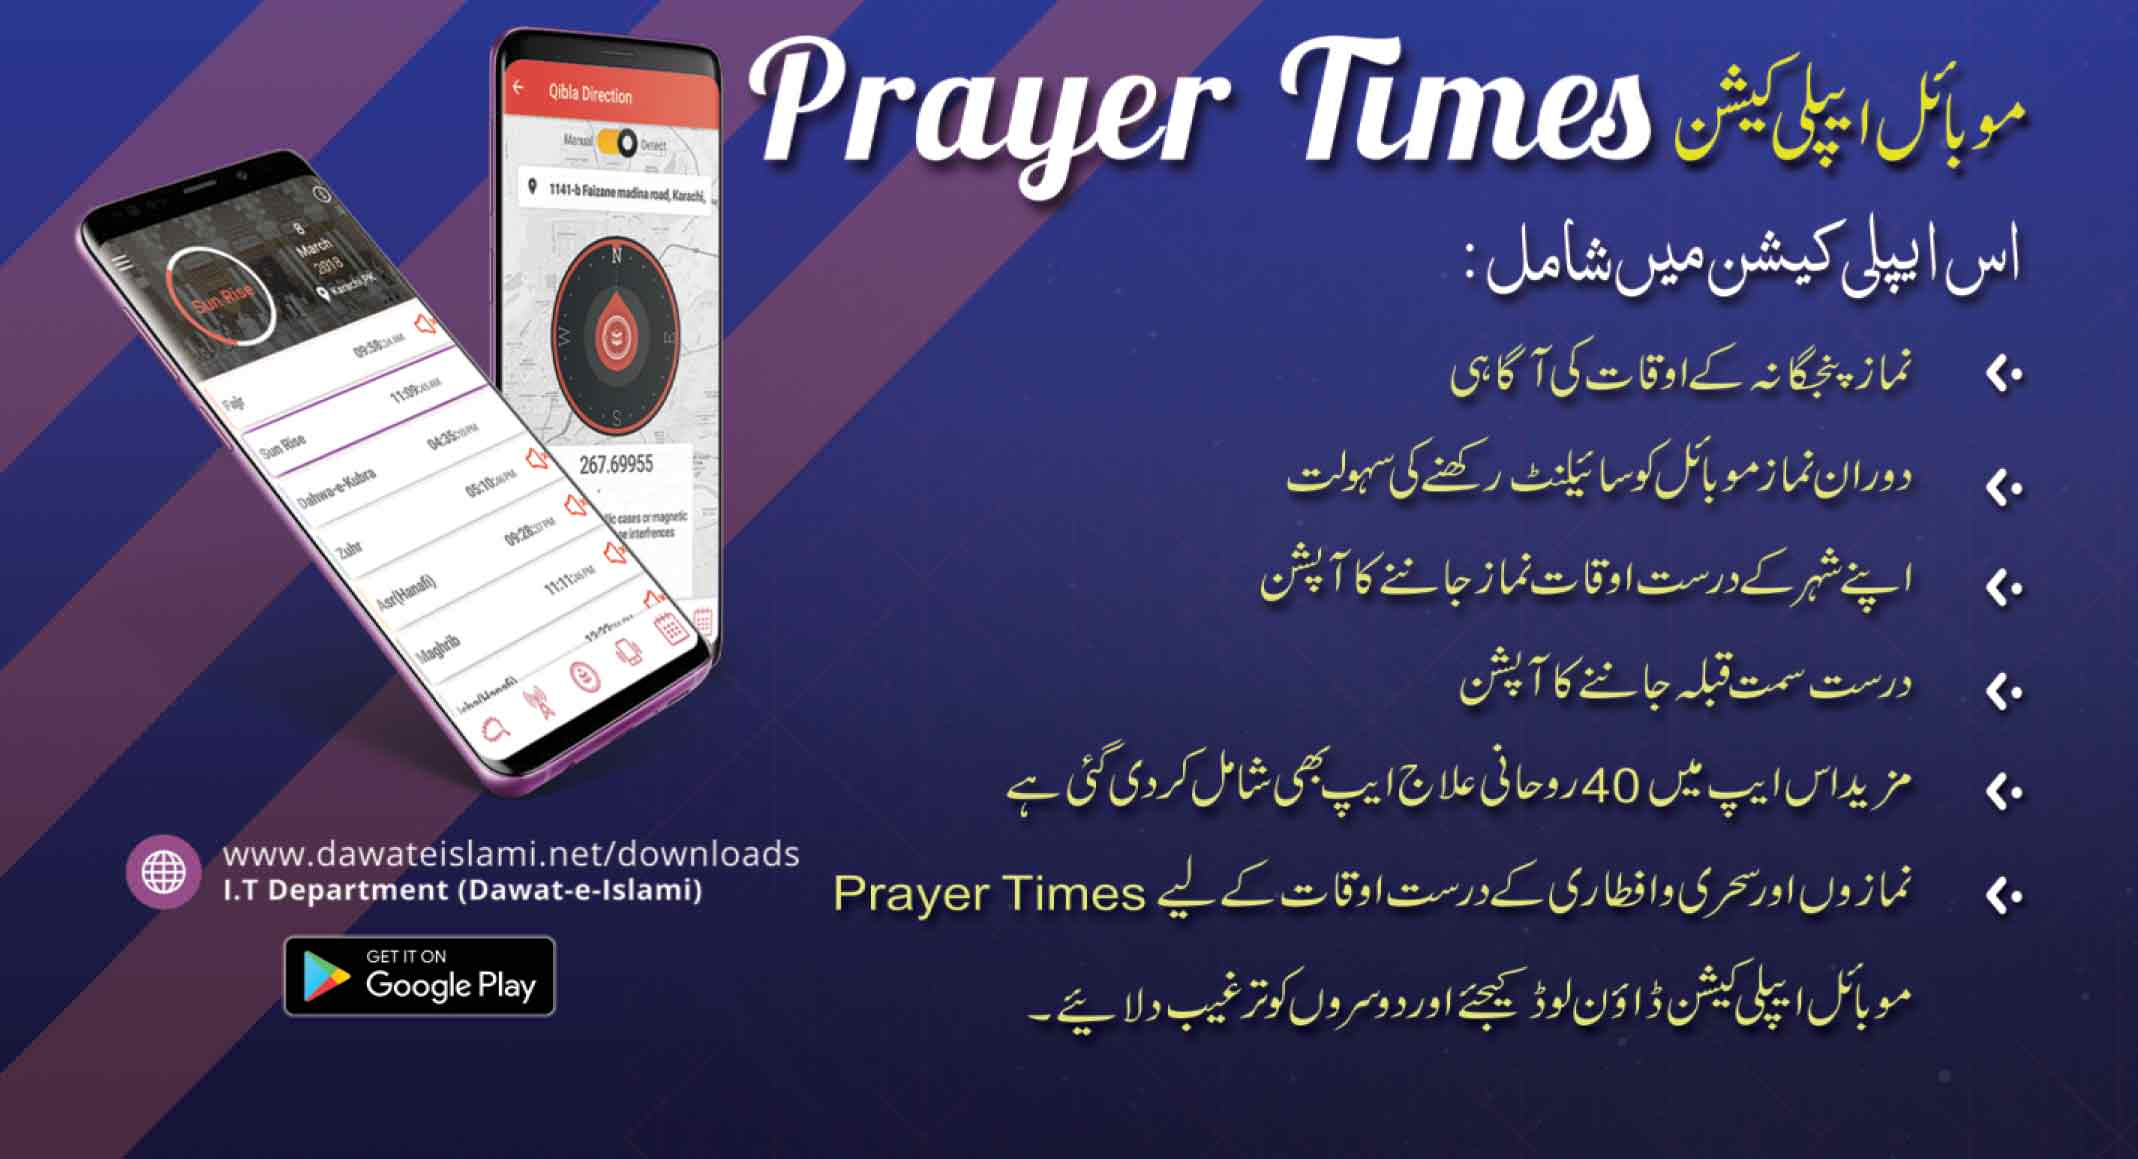 Prayer Times موبائل ایپلی کیشن